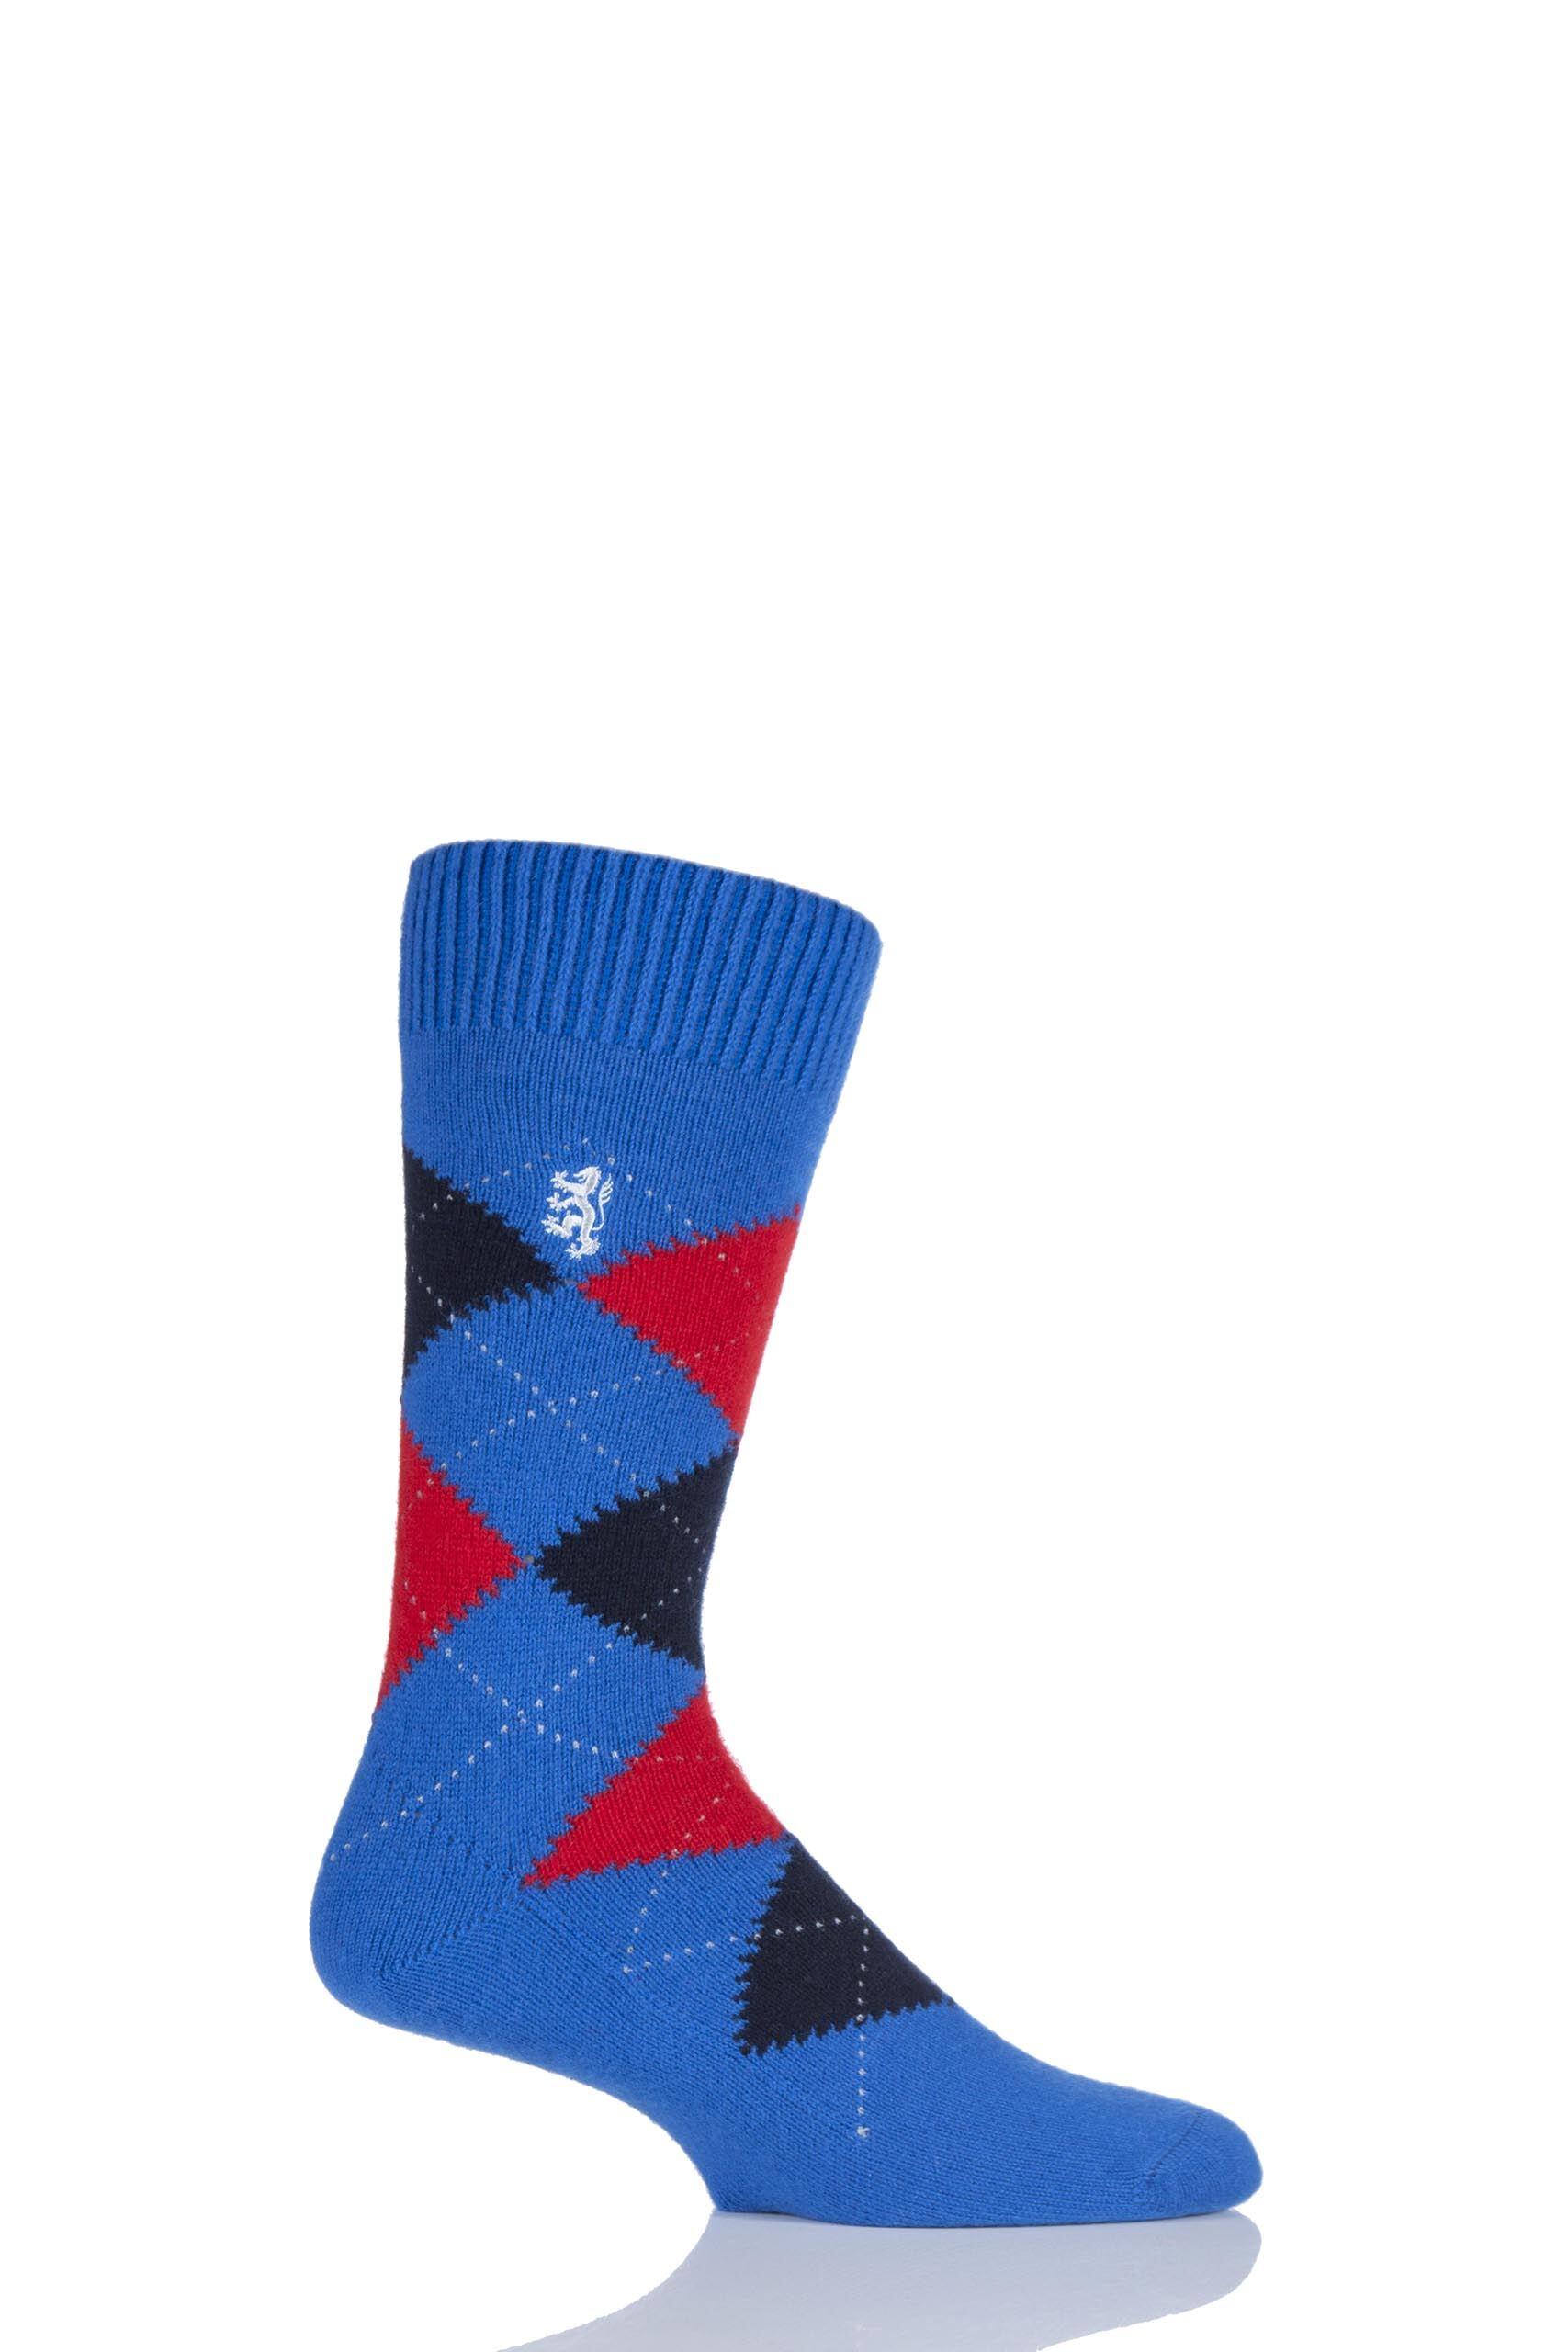 Image of 1 Pair Bright Blue 85% Cashmere Argyle Socks Men's 9-11 Mens - Pringle of Scotland